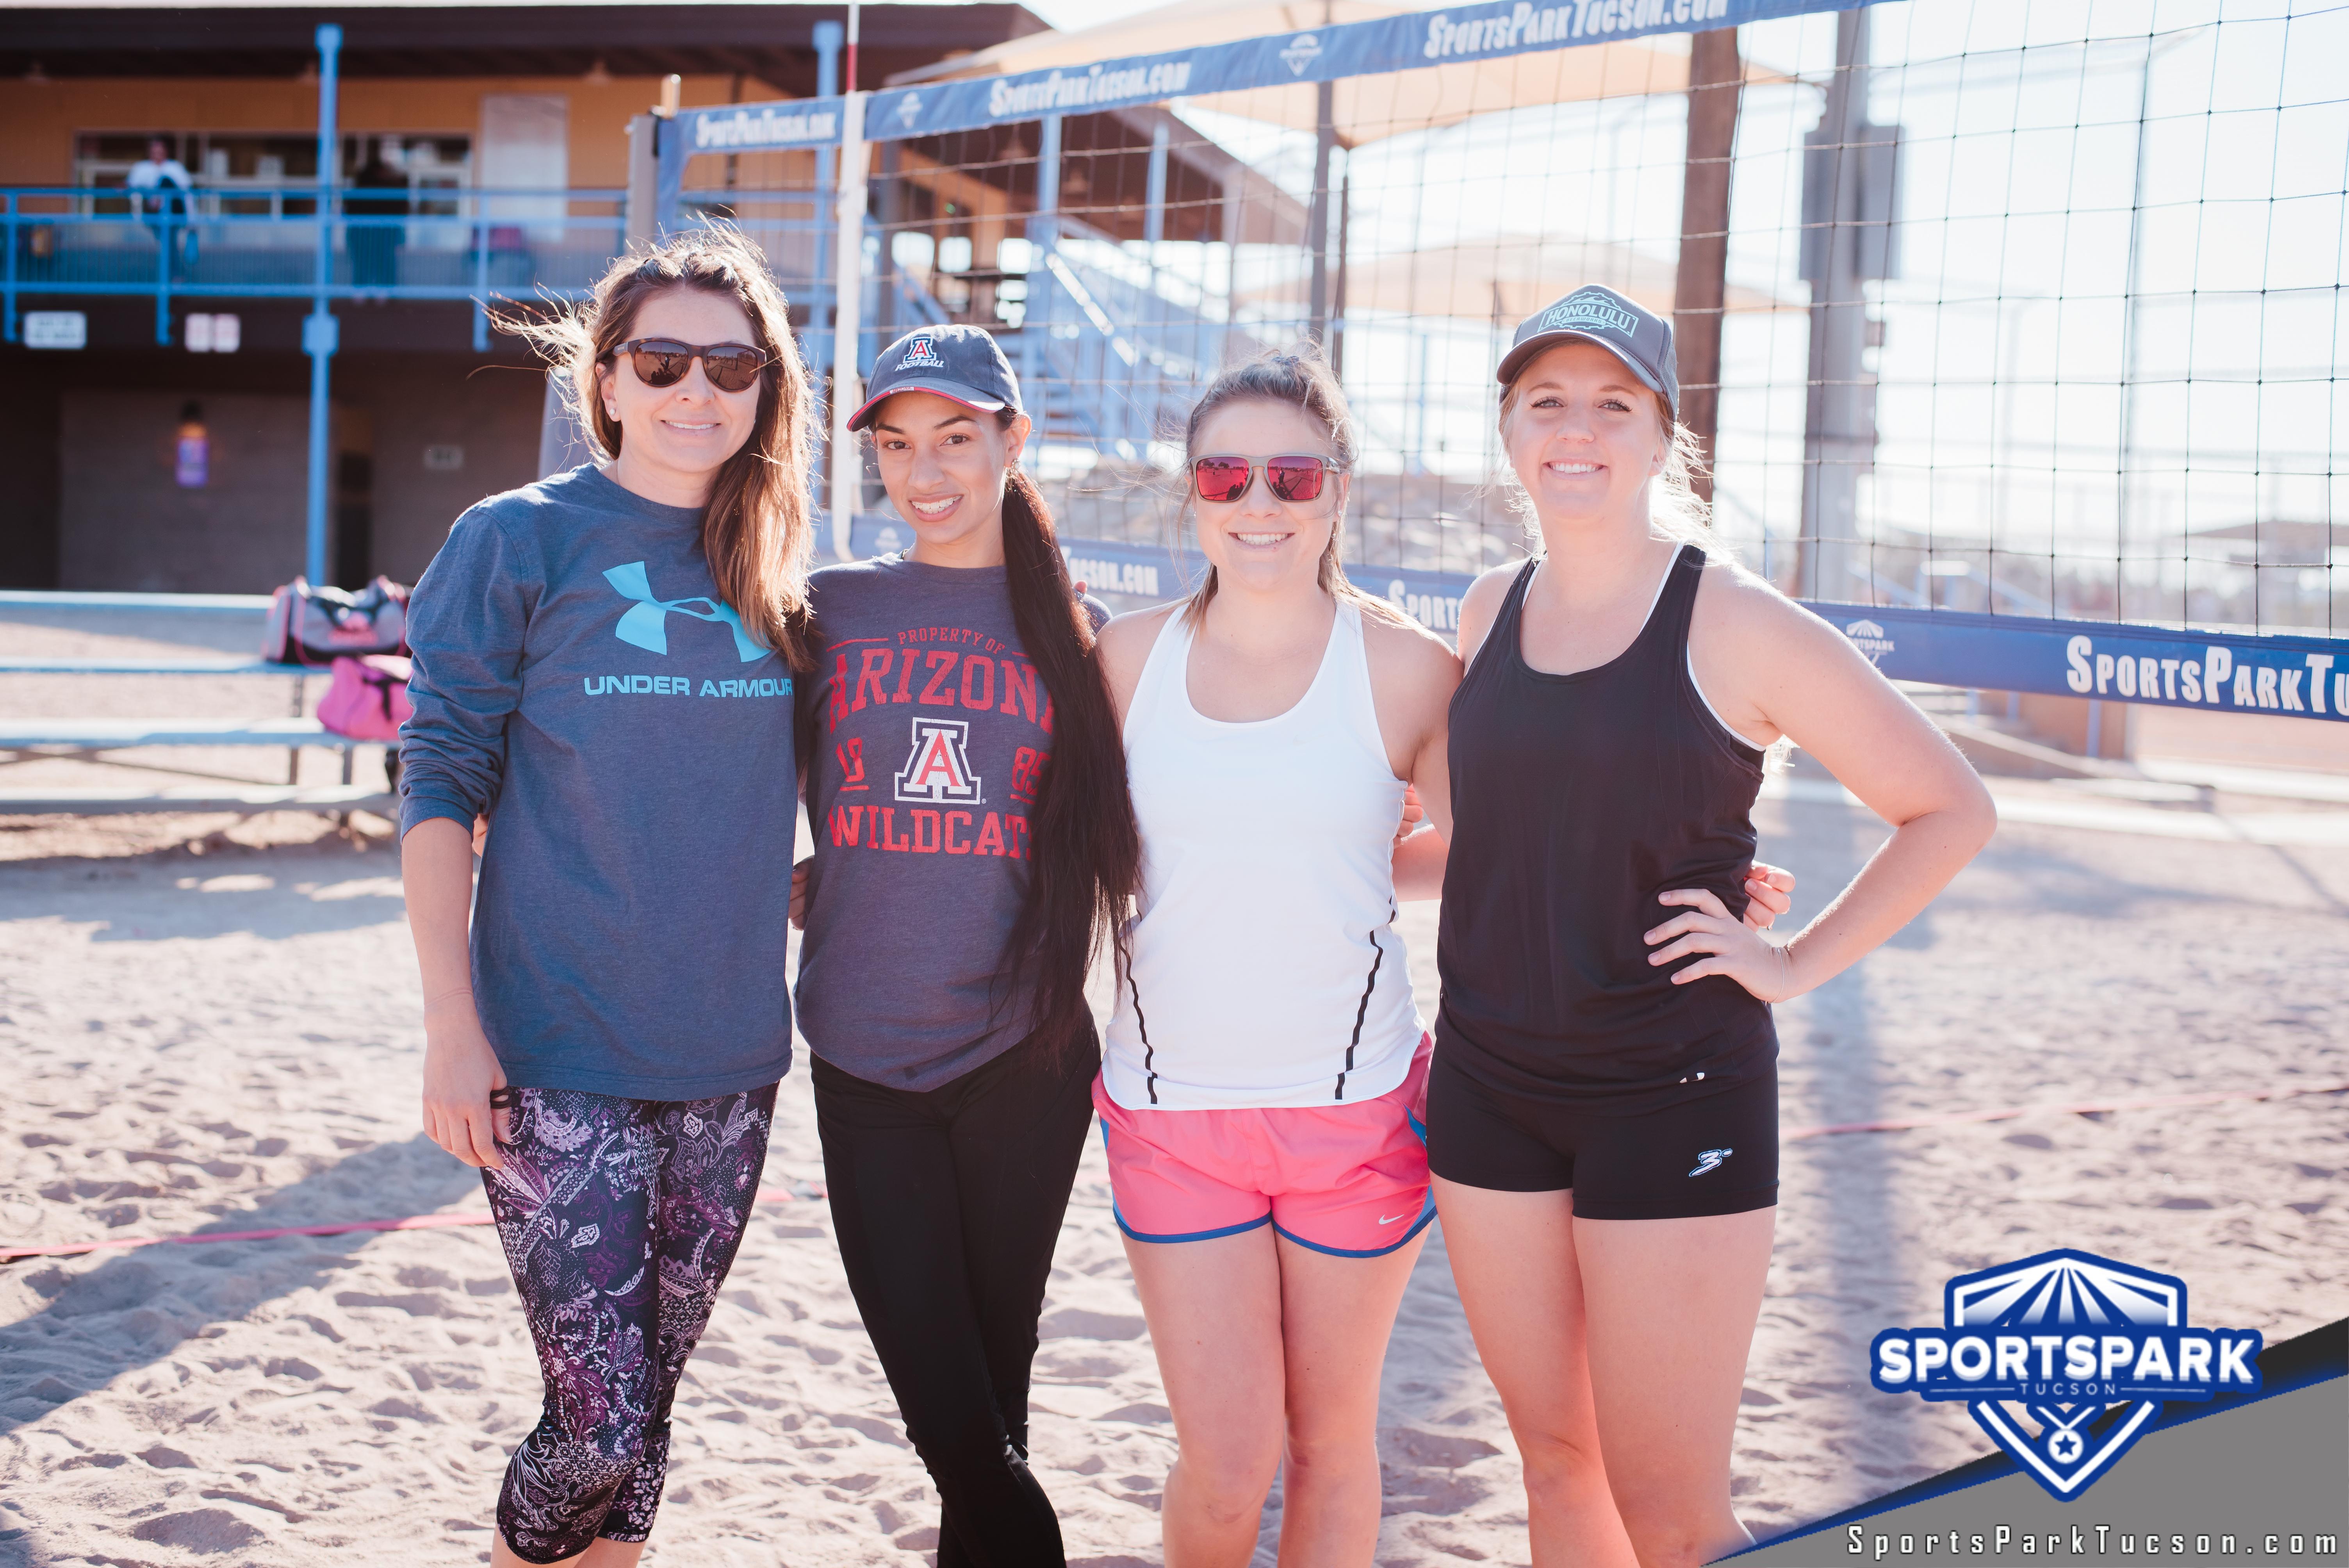 Nov 10th RWB Volleyball Tournament Women's 4v4 - A/B, Team: She-Unit